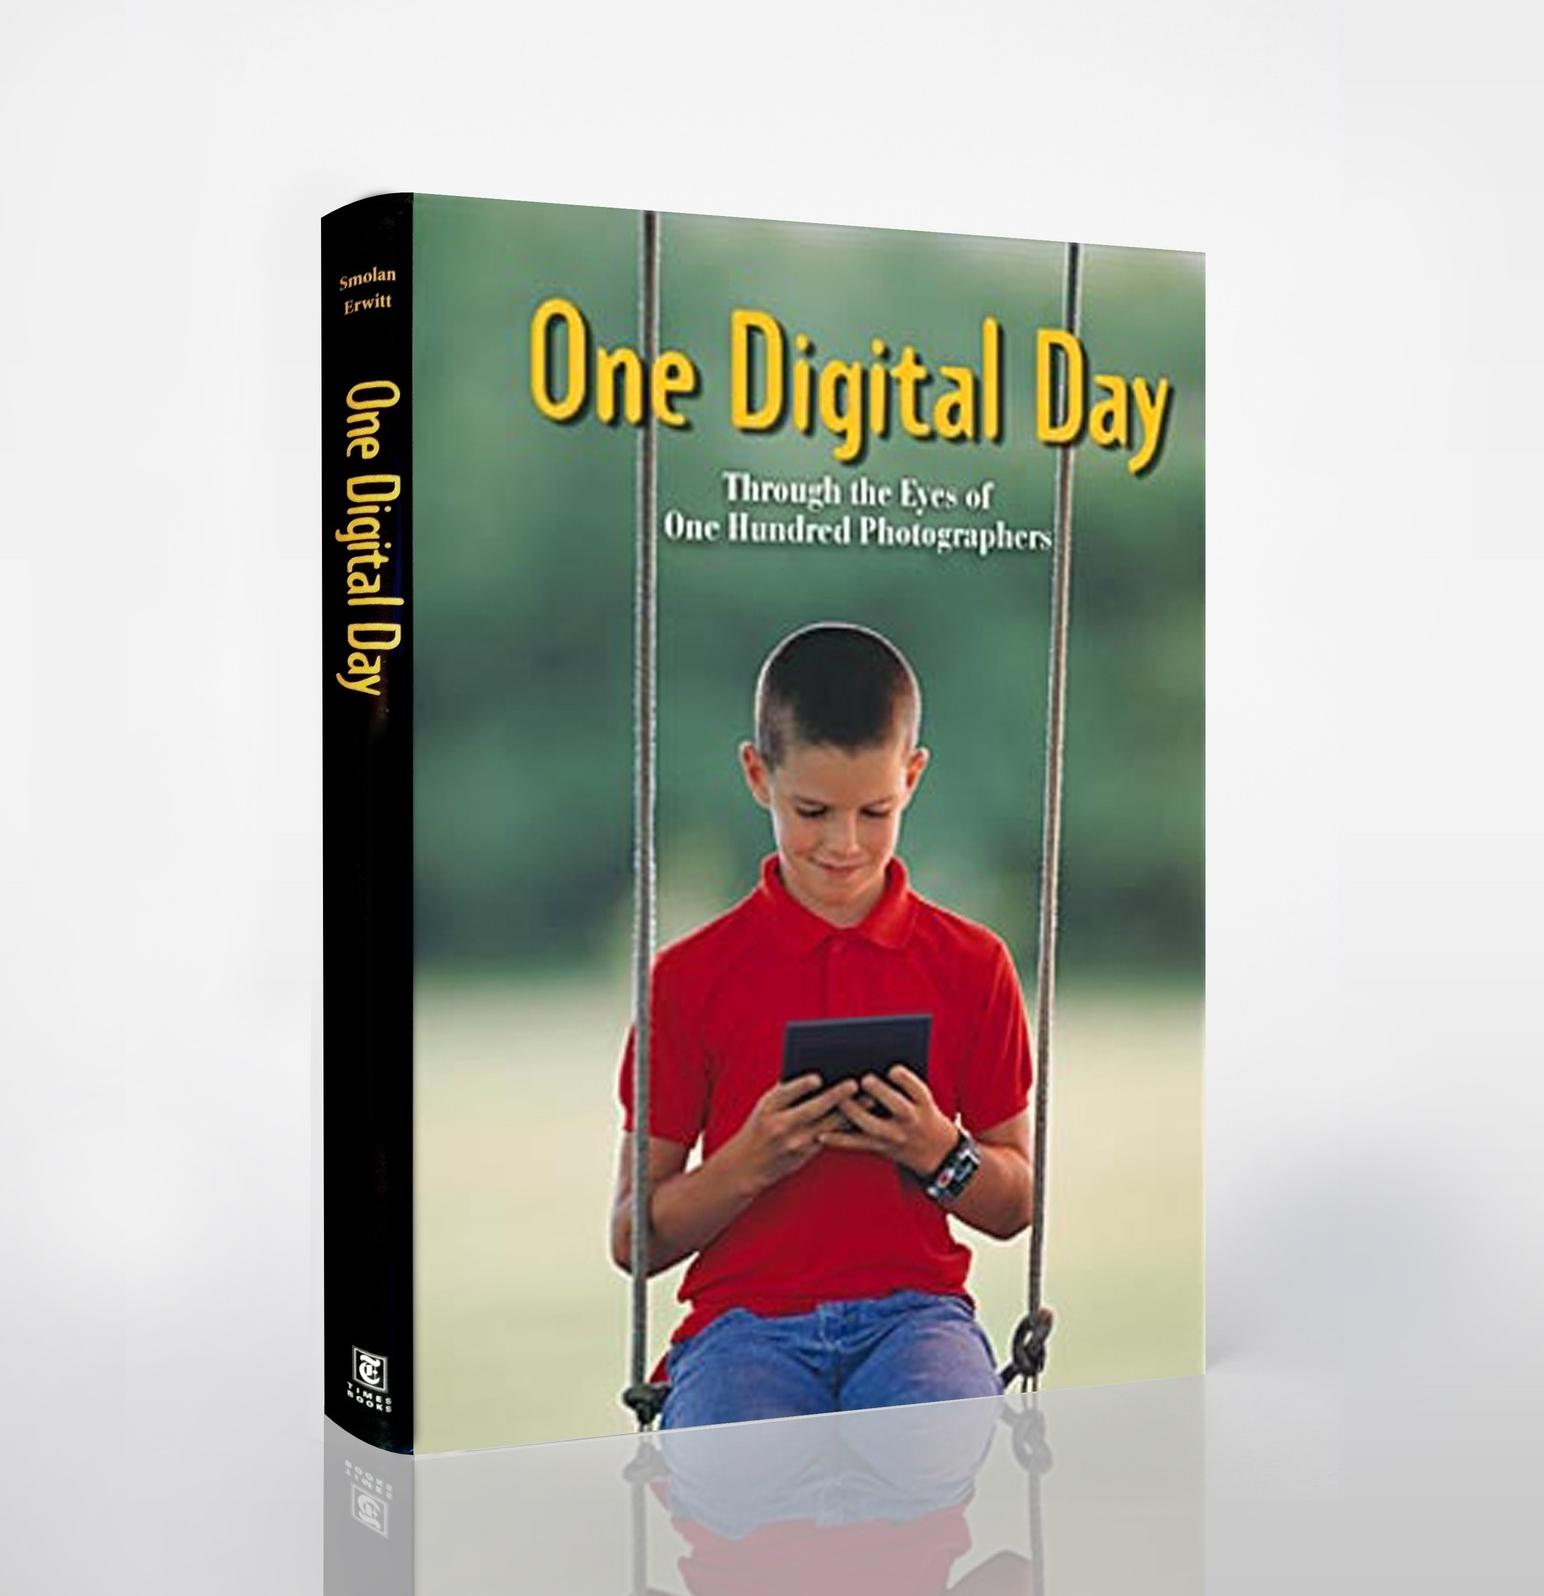 One Digital Day By Rick Smolan & Jennifer Erwitt